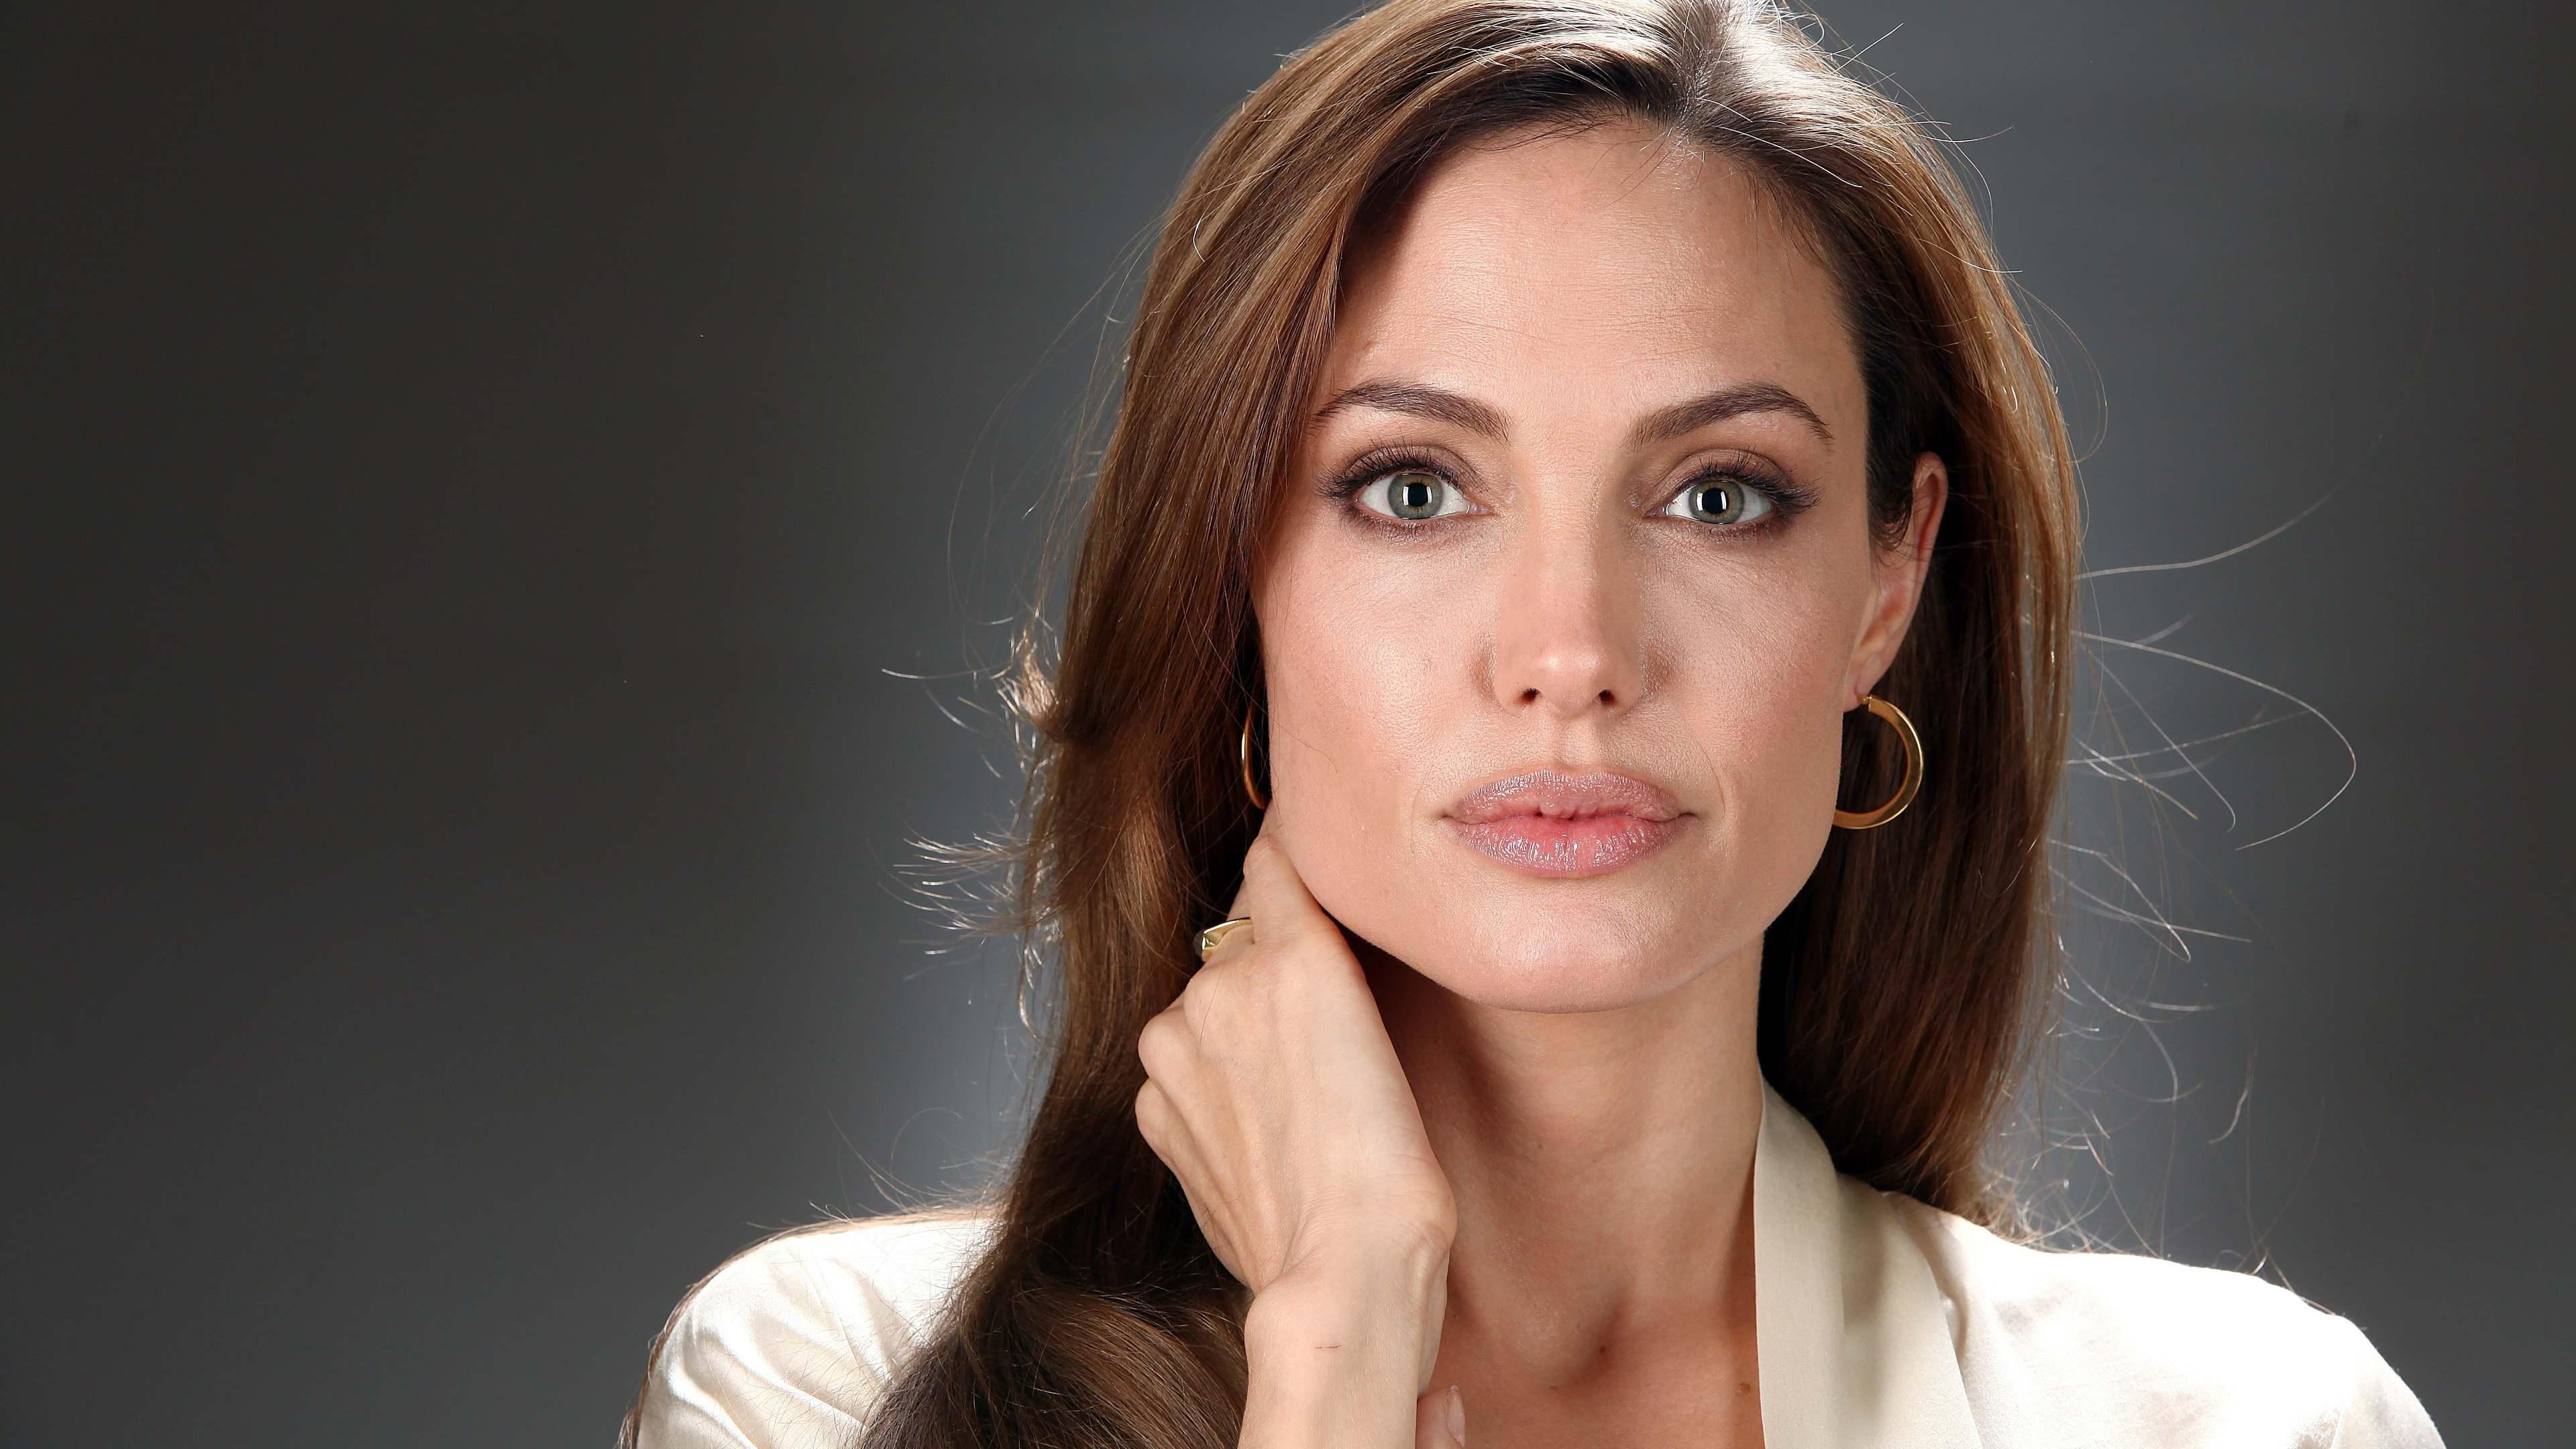 angelina jolie 5k 1536950637 - Angelina Jolie 5k - hd-wallpapers, girls wallpapers, celebrities wallpapers, angelina jolie wallpapers, 5k wallpapers, 4k-wallpapers